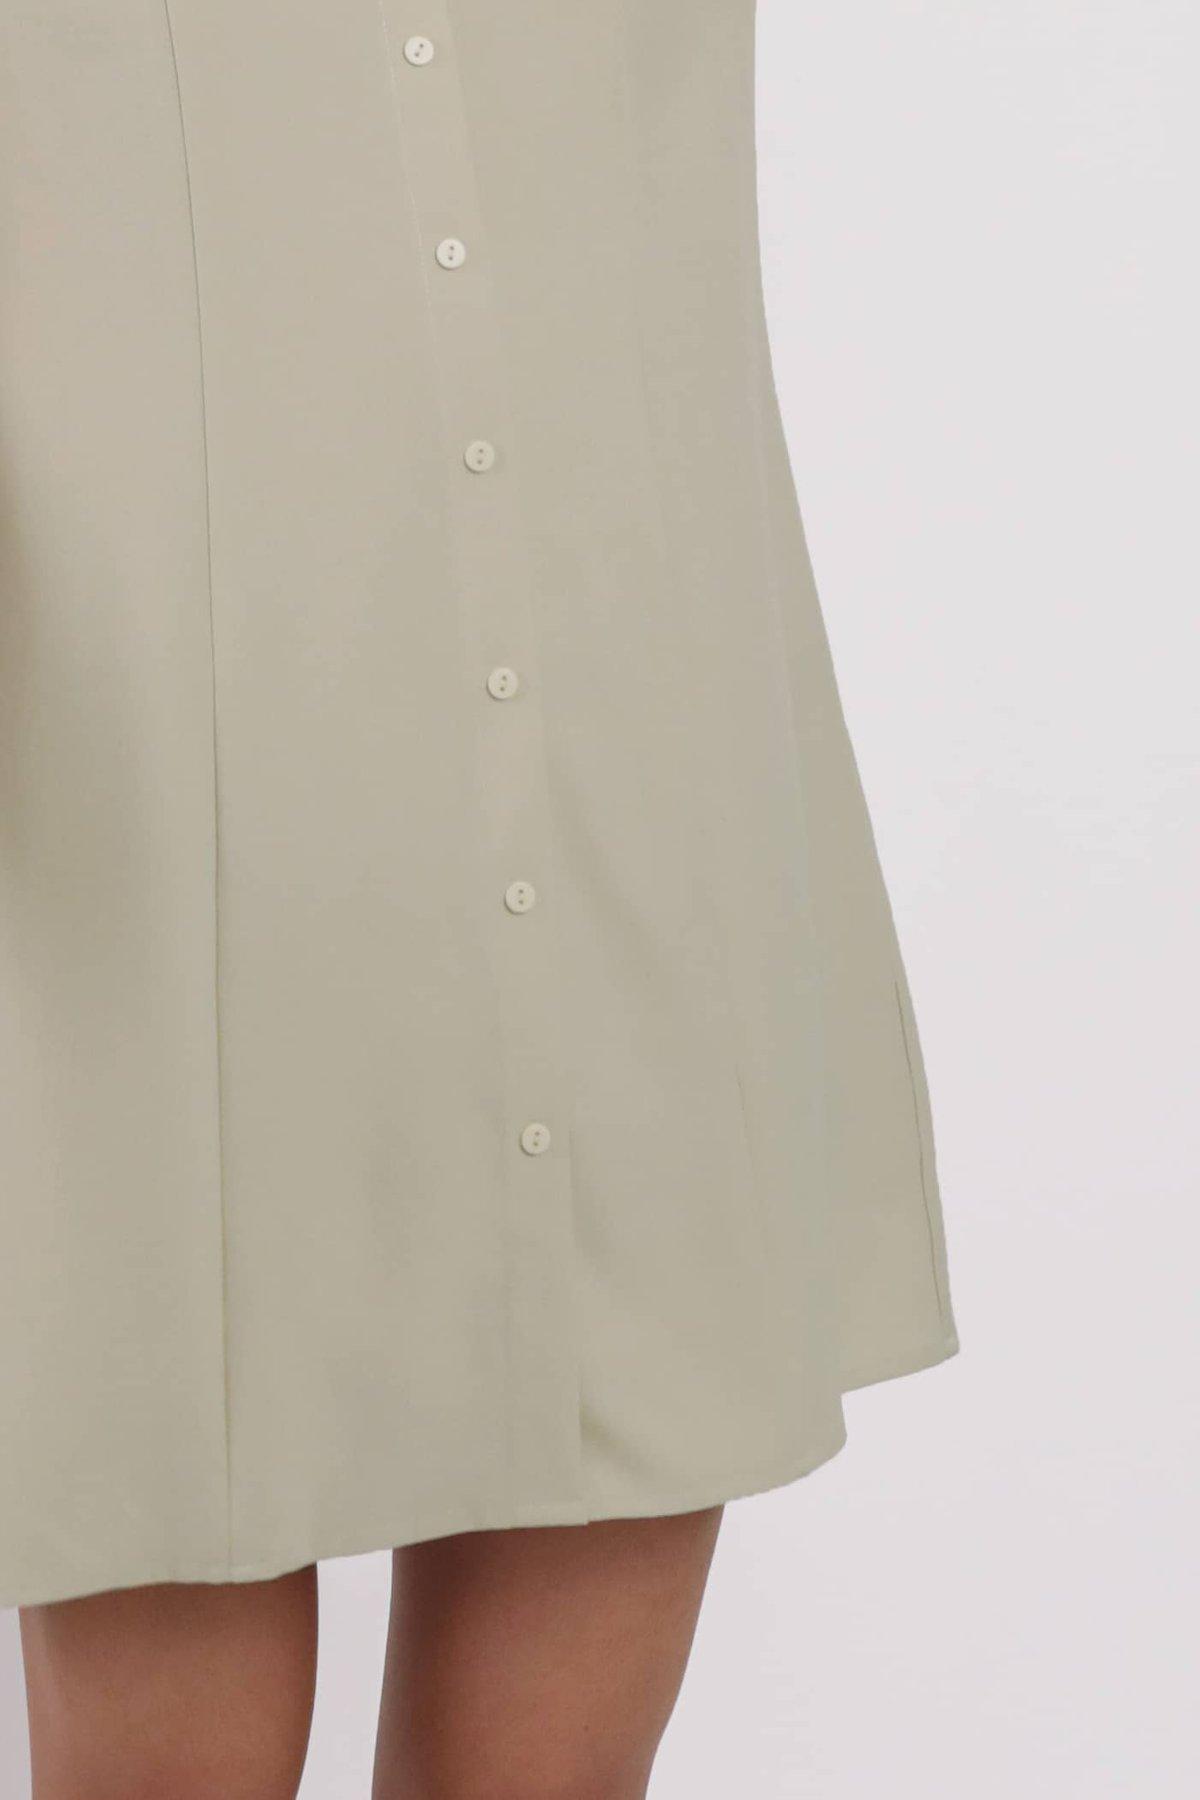 Nally Sleeved Dress (Light Mint)